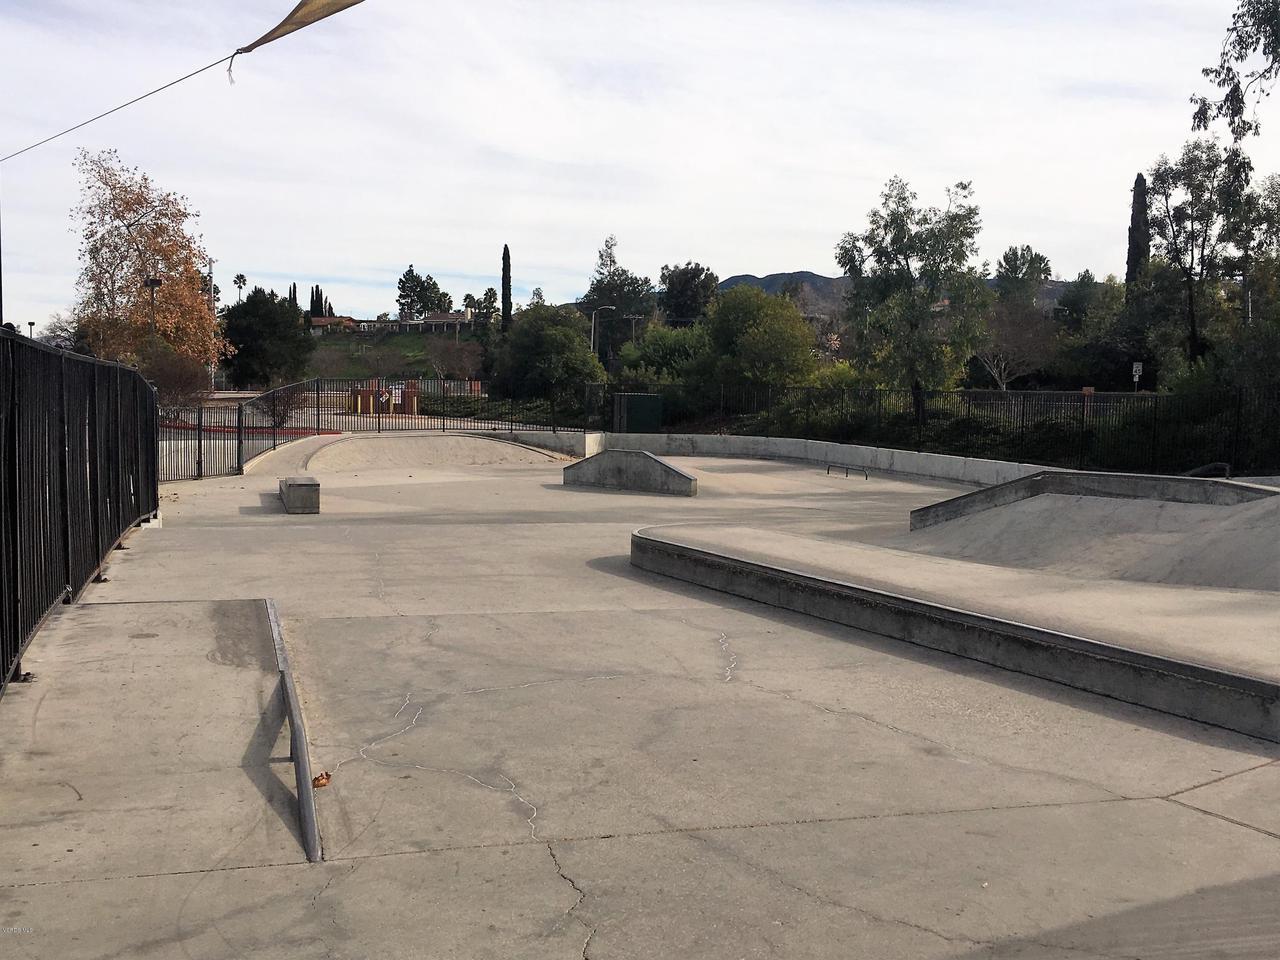 716 CAYO GRANDE, Newbury Park, CA 91320 - 716 Cayo Grande_Borchard Skate Park 2